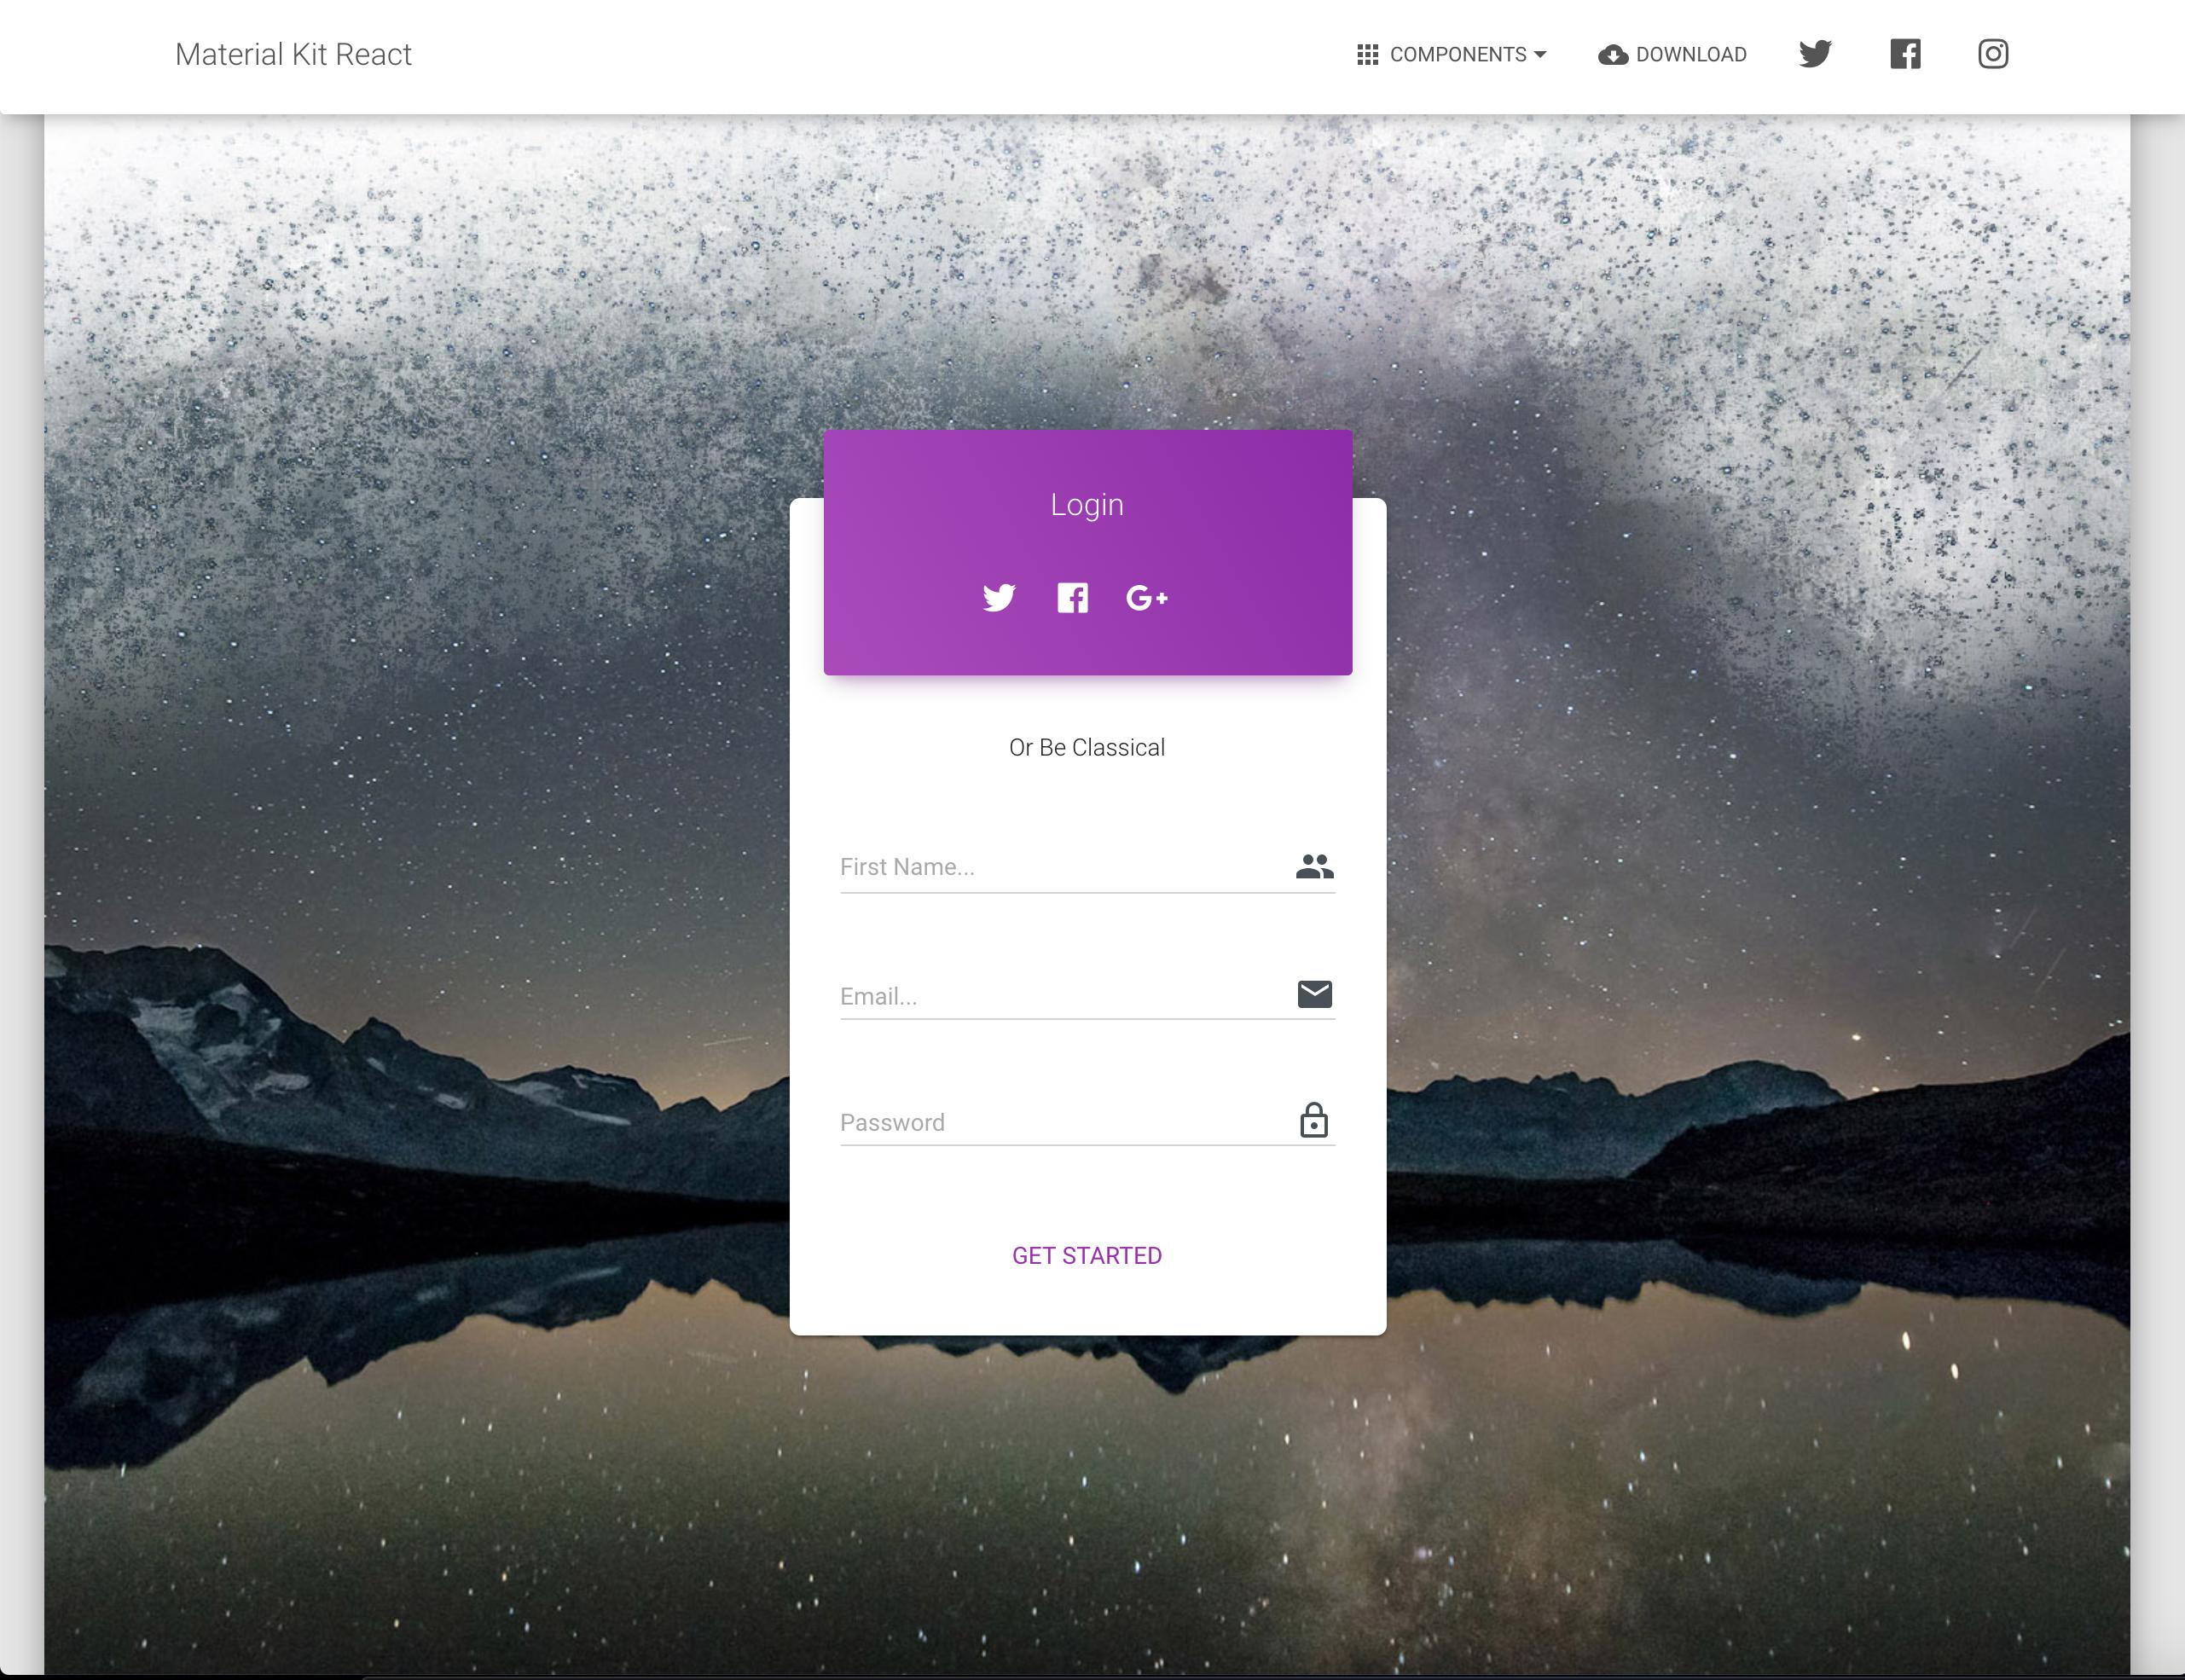 GitHub - creativetimofficial/material-kit-react: Material